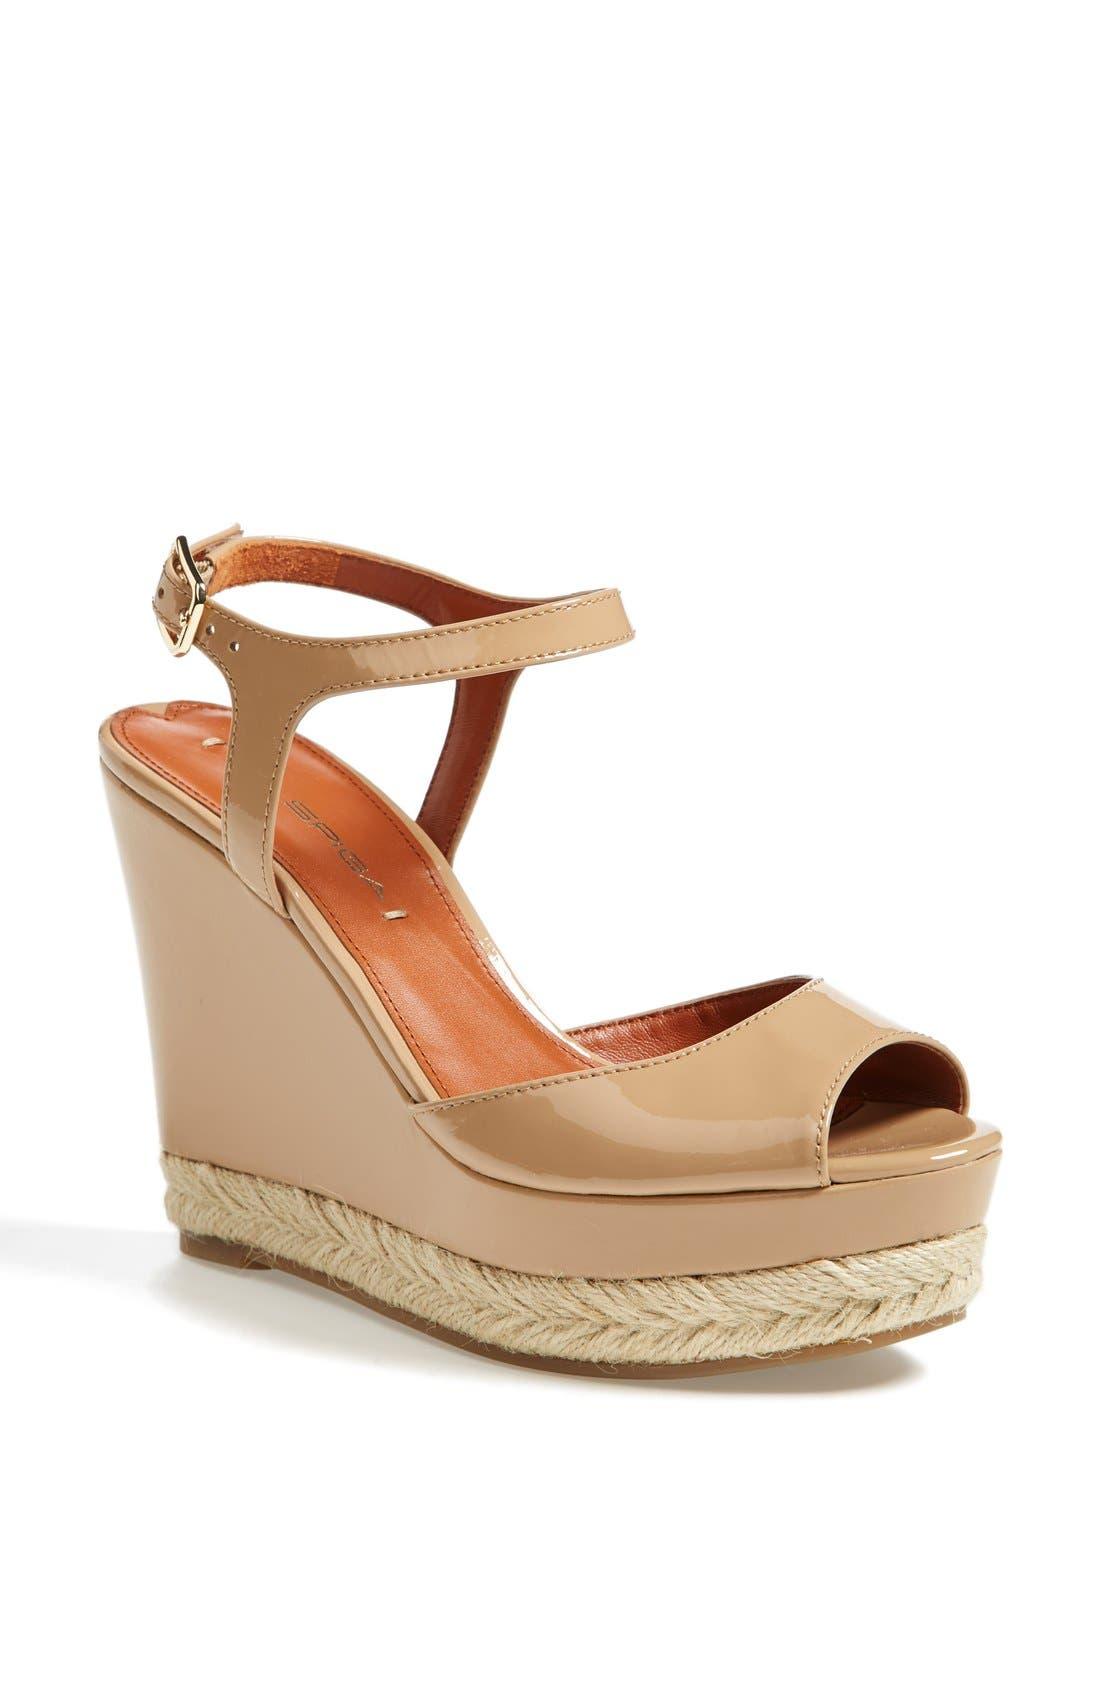 Main Image - Via Spiga 'Melia' Wedge Sandal